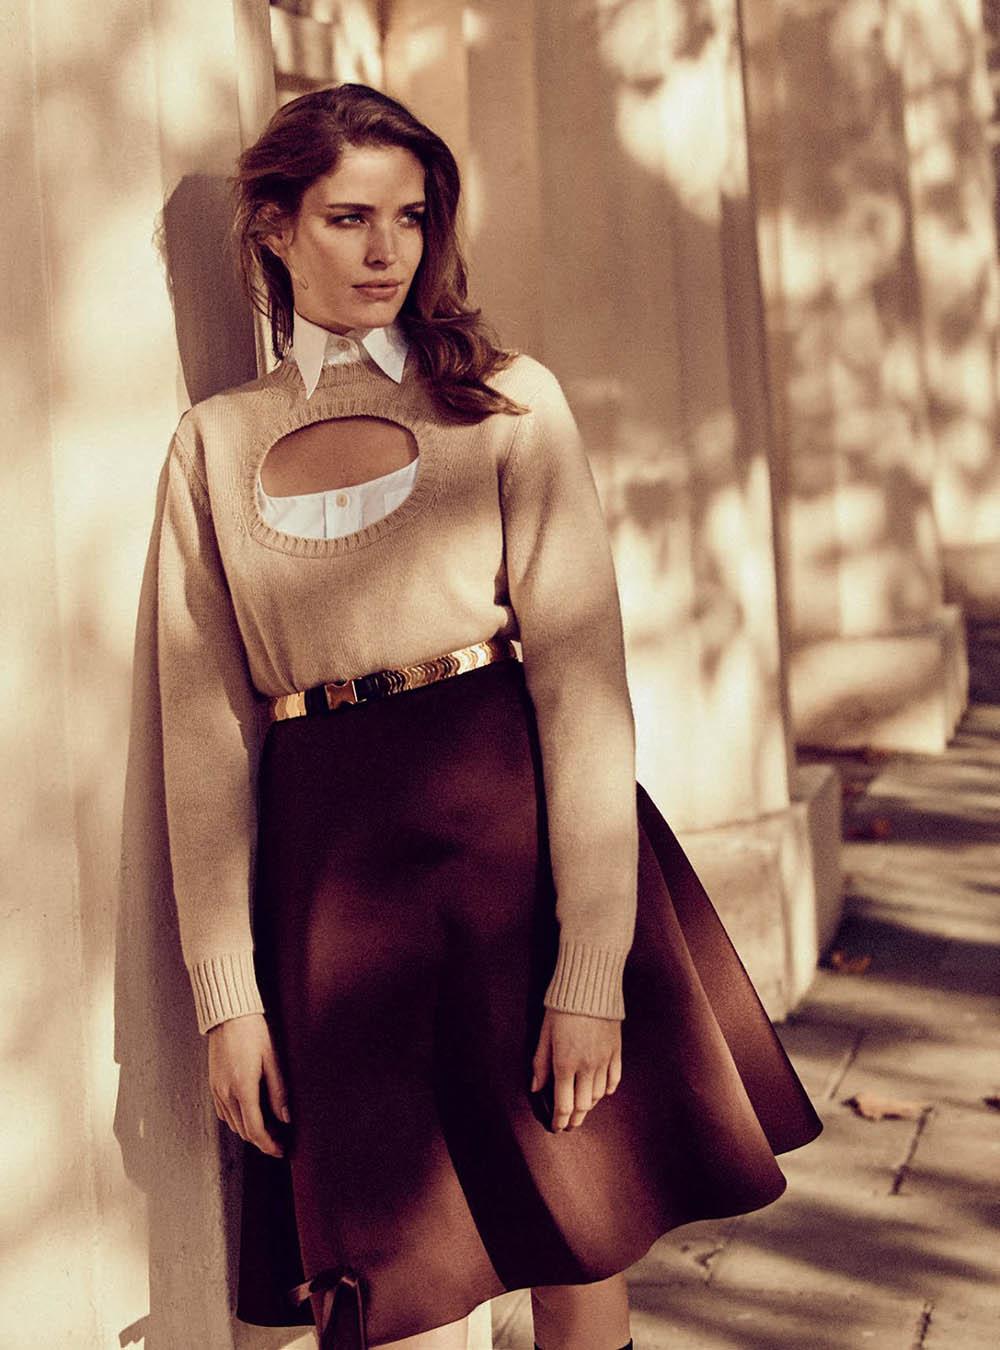 Alisa-Ahmann-by-Regan-Cameron-for-Harper's-Bazaar-UK-March-2019-11.jpg